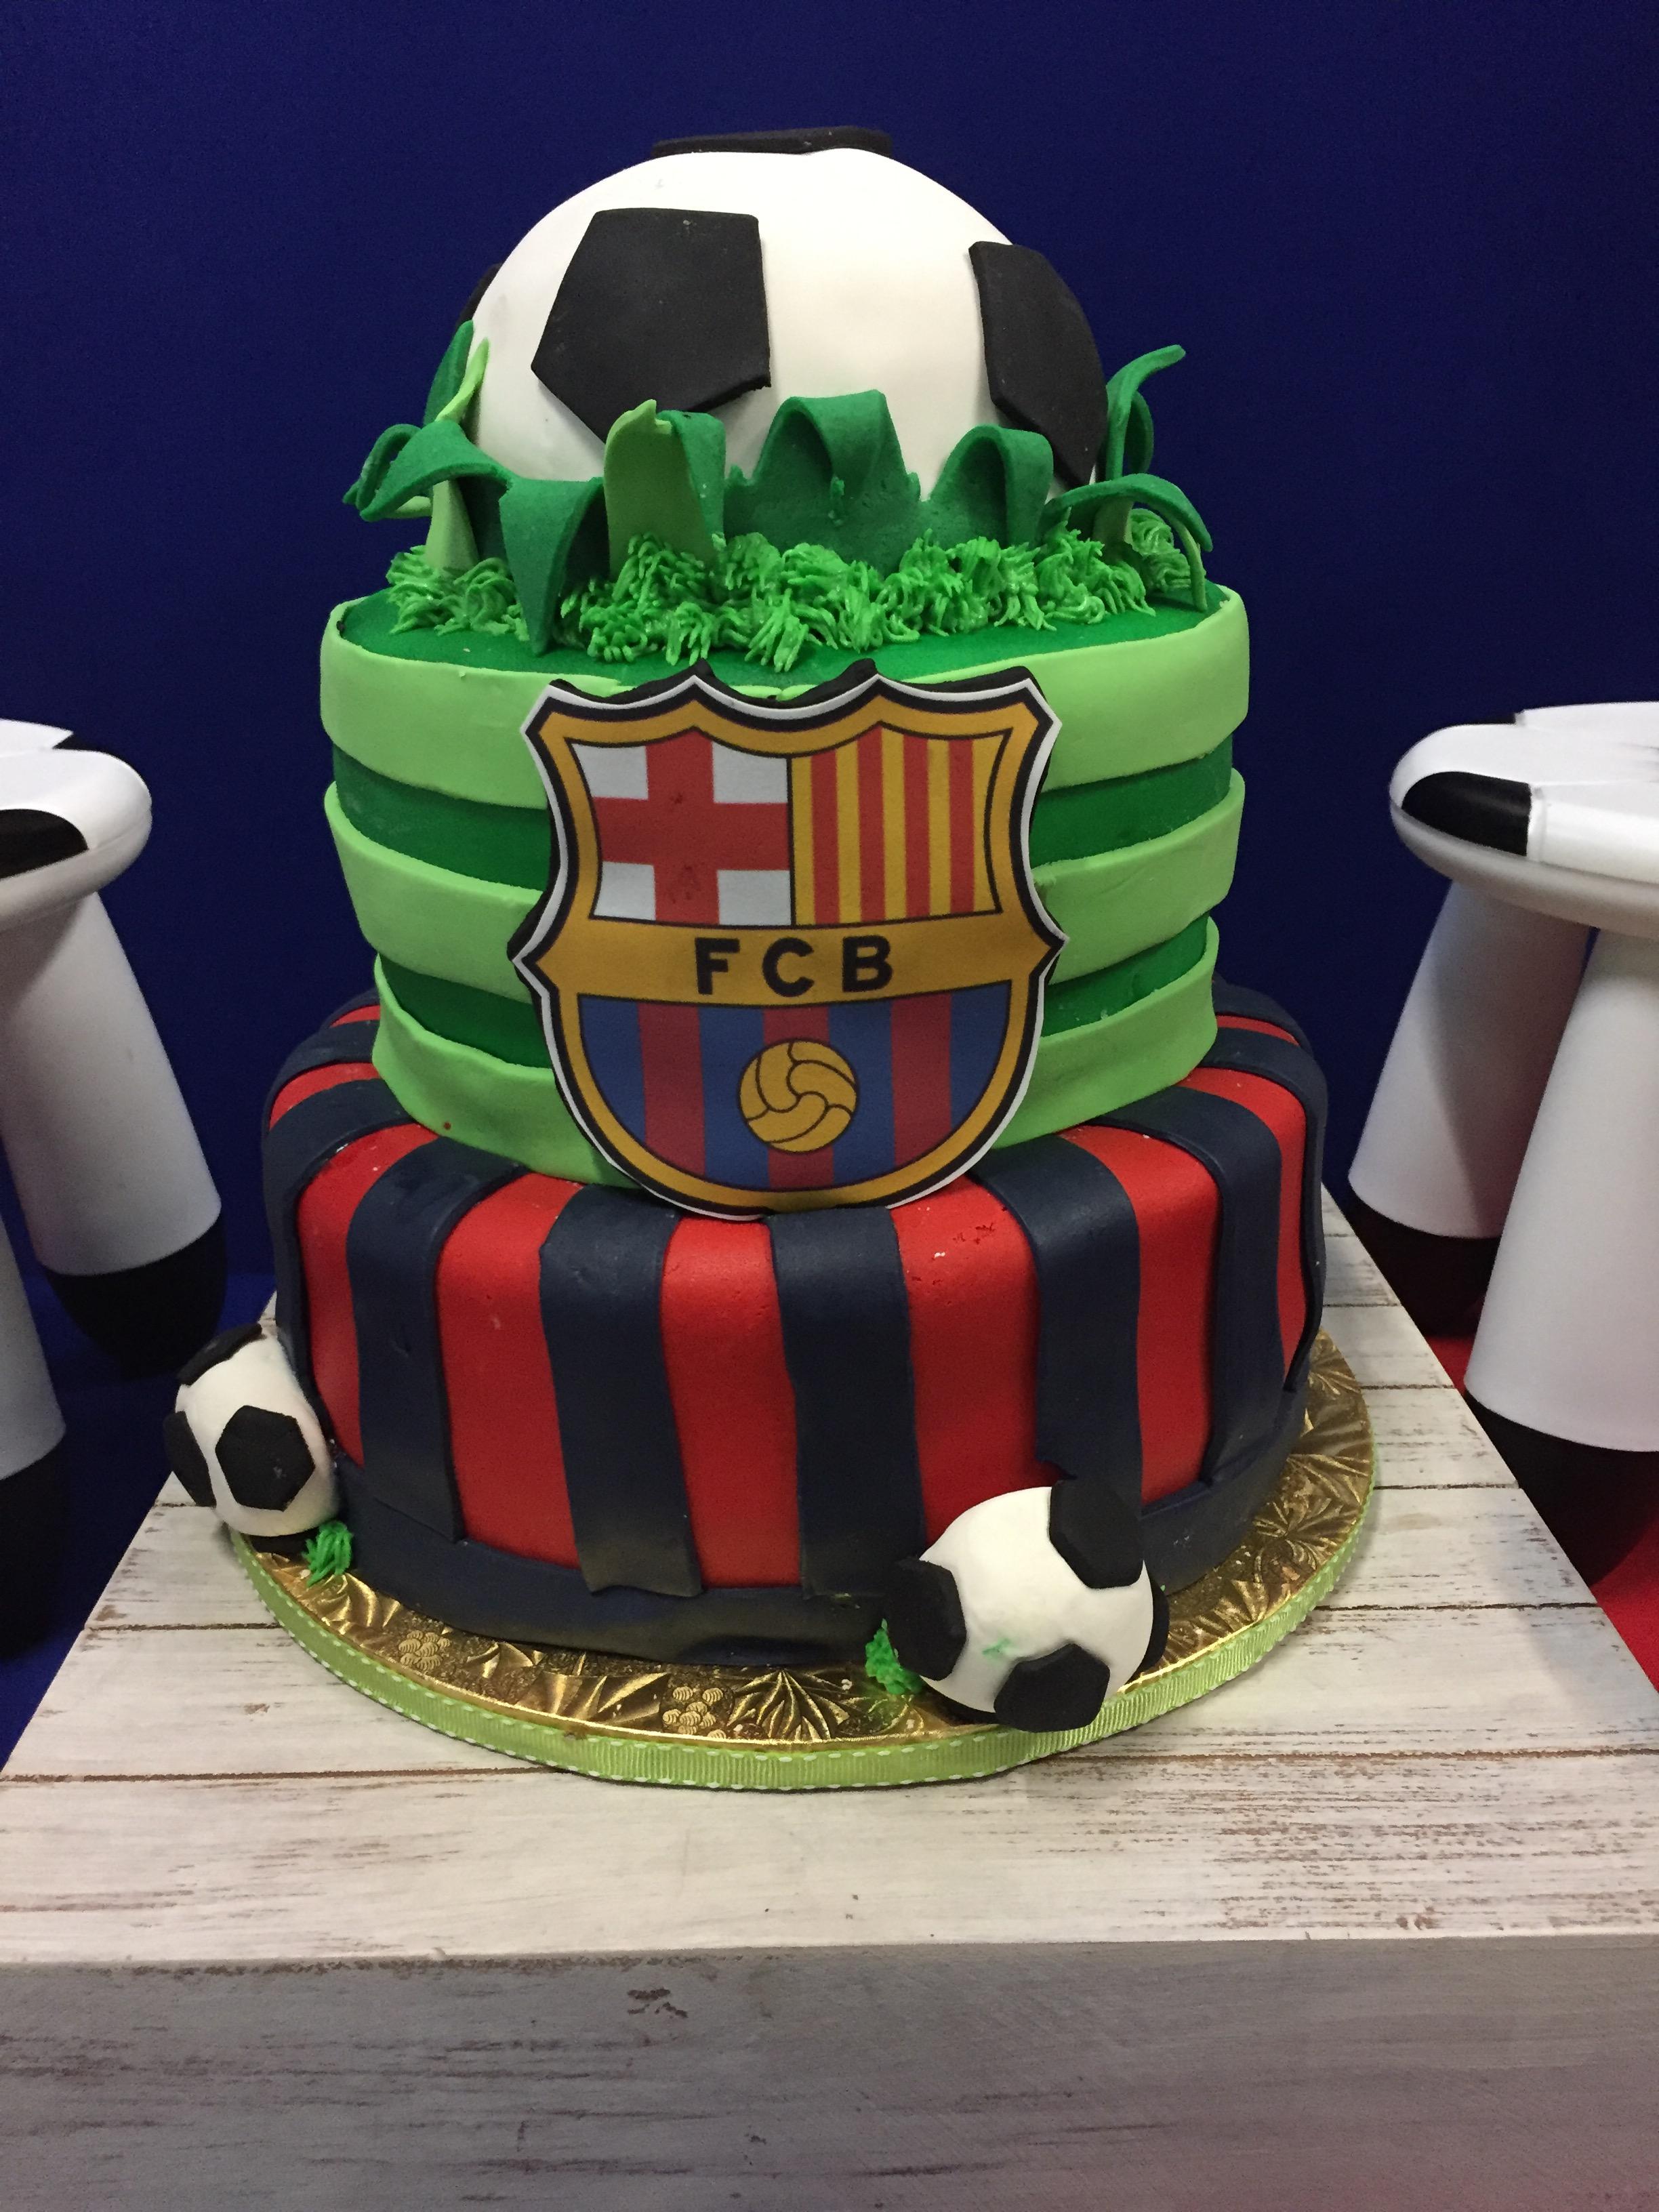 Urban Soccer Five Birthday party 2.jpeg